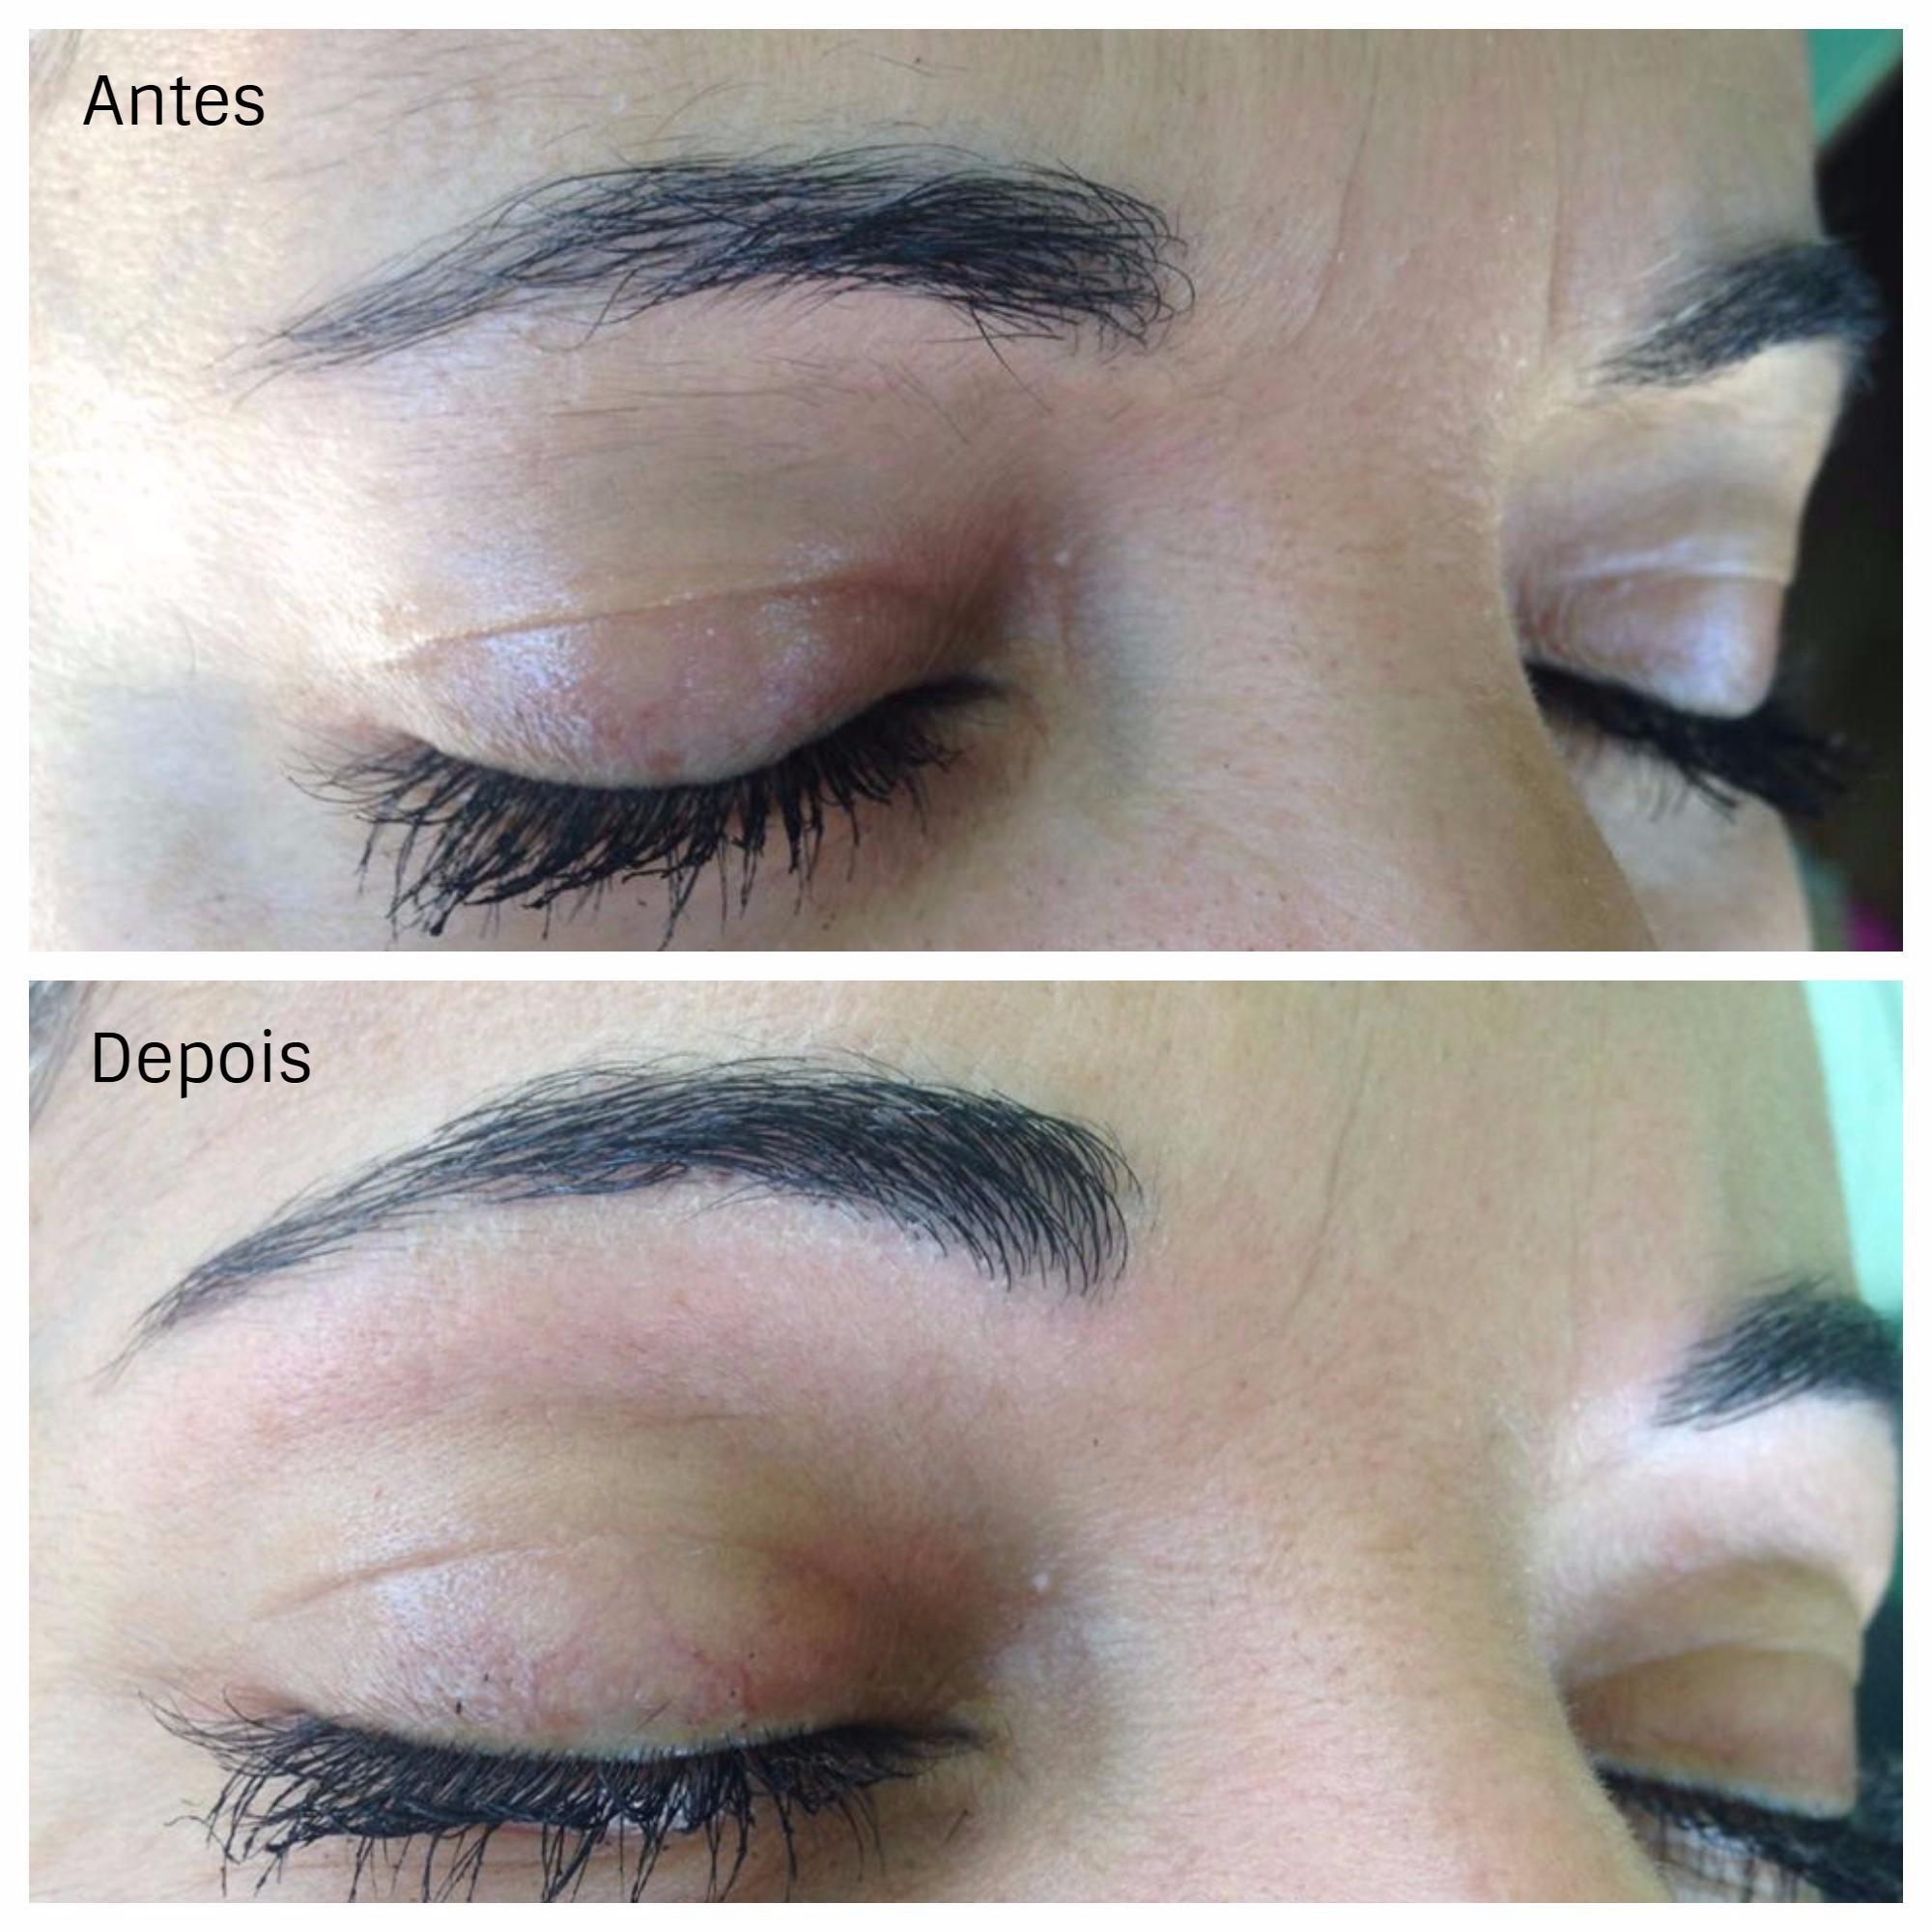 esteticista cosmetólogo(a) designer de sobrancelhas massoterapeuta promotor(a) de vendas escovista assistente esteticista recepcionista